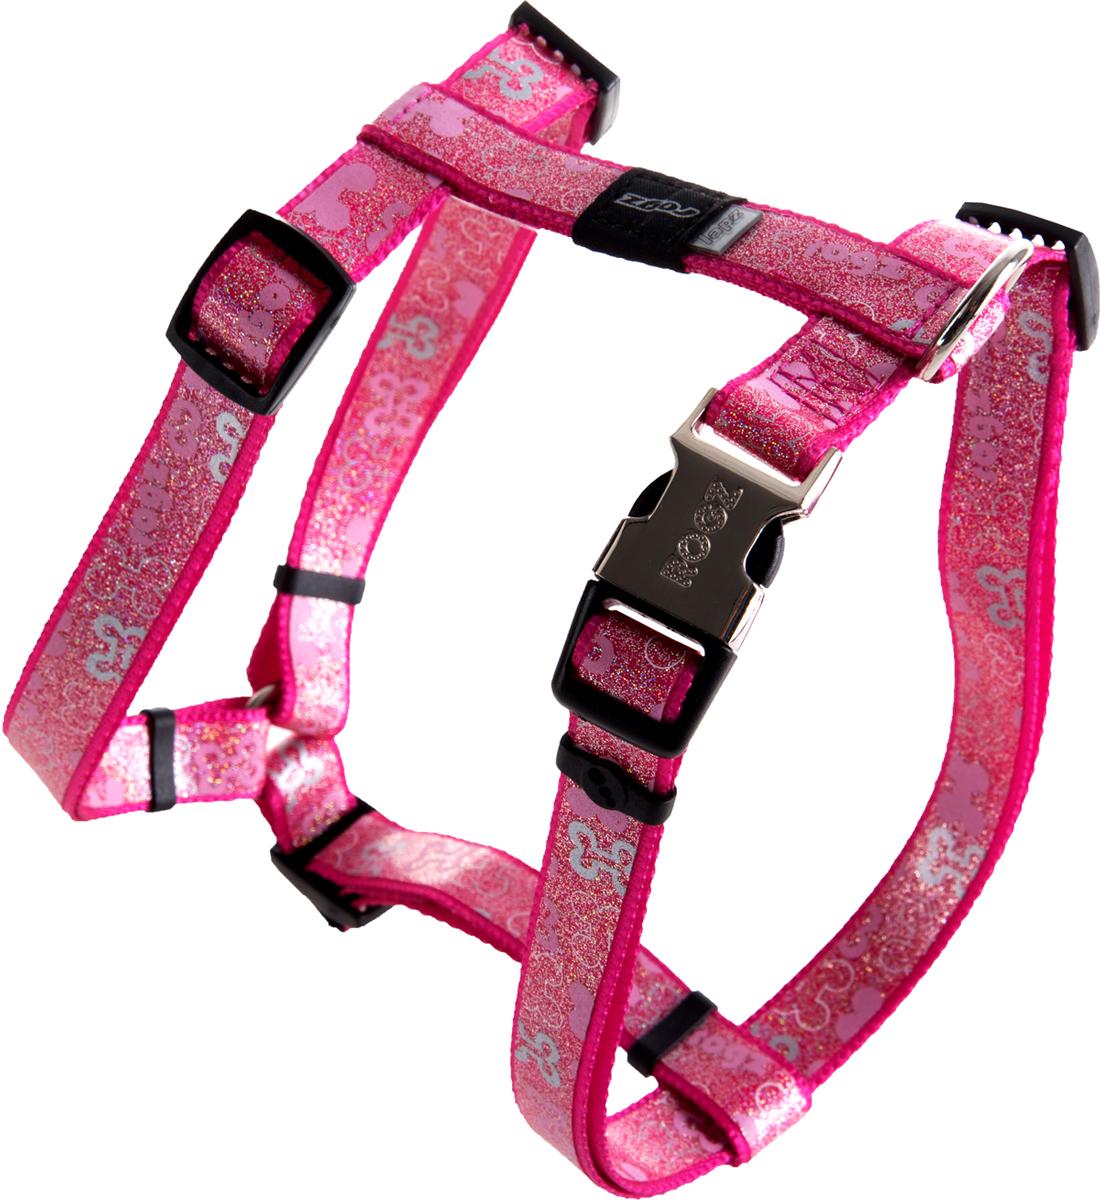 "Шлейка для собак Rogz ""Trendy"", цвет: розовый, ширина 1,6 см. Размер M"